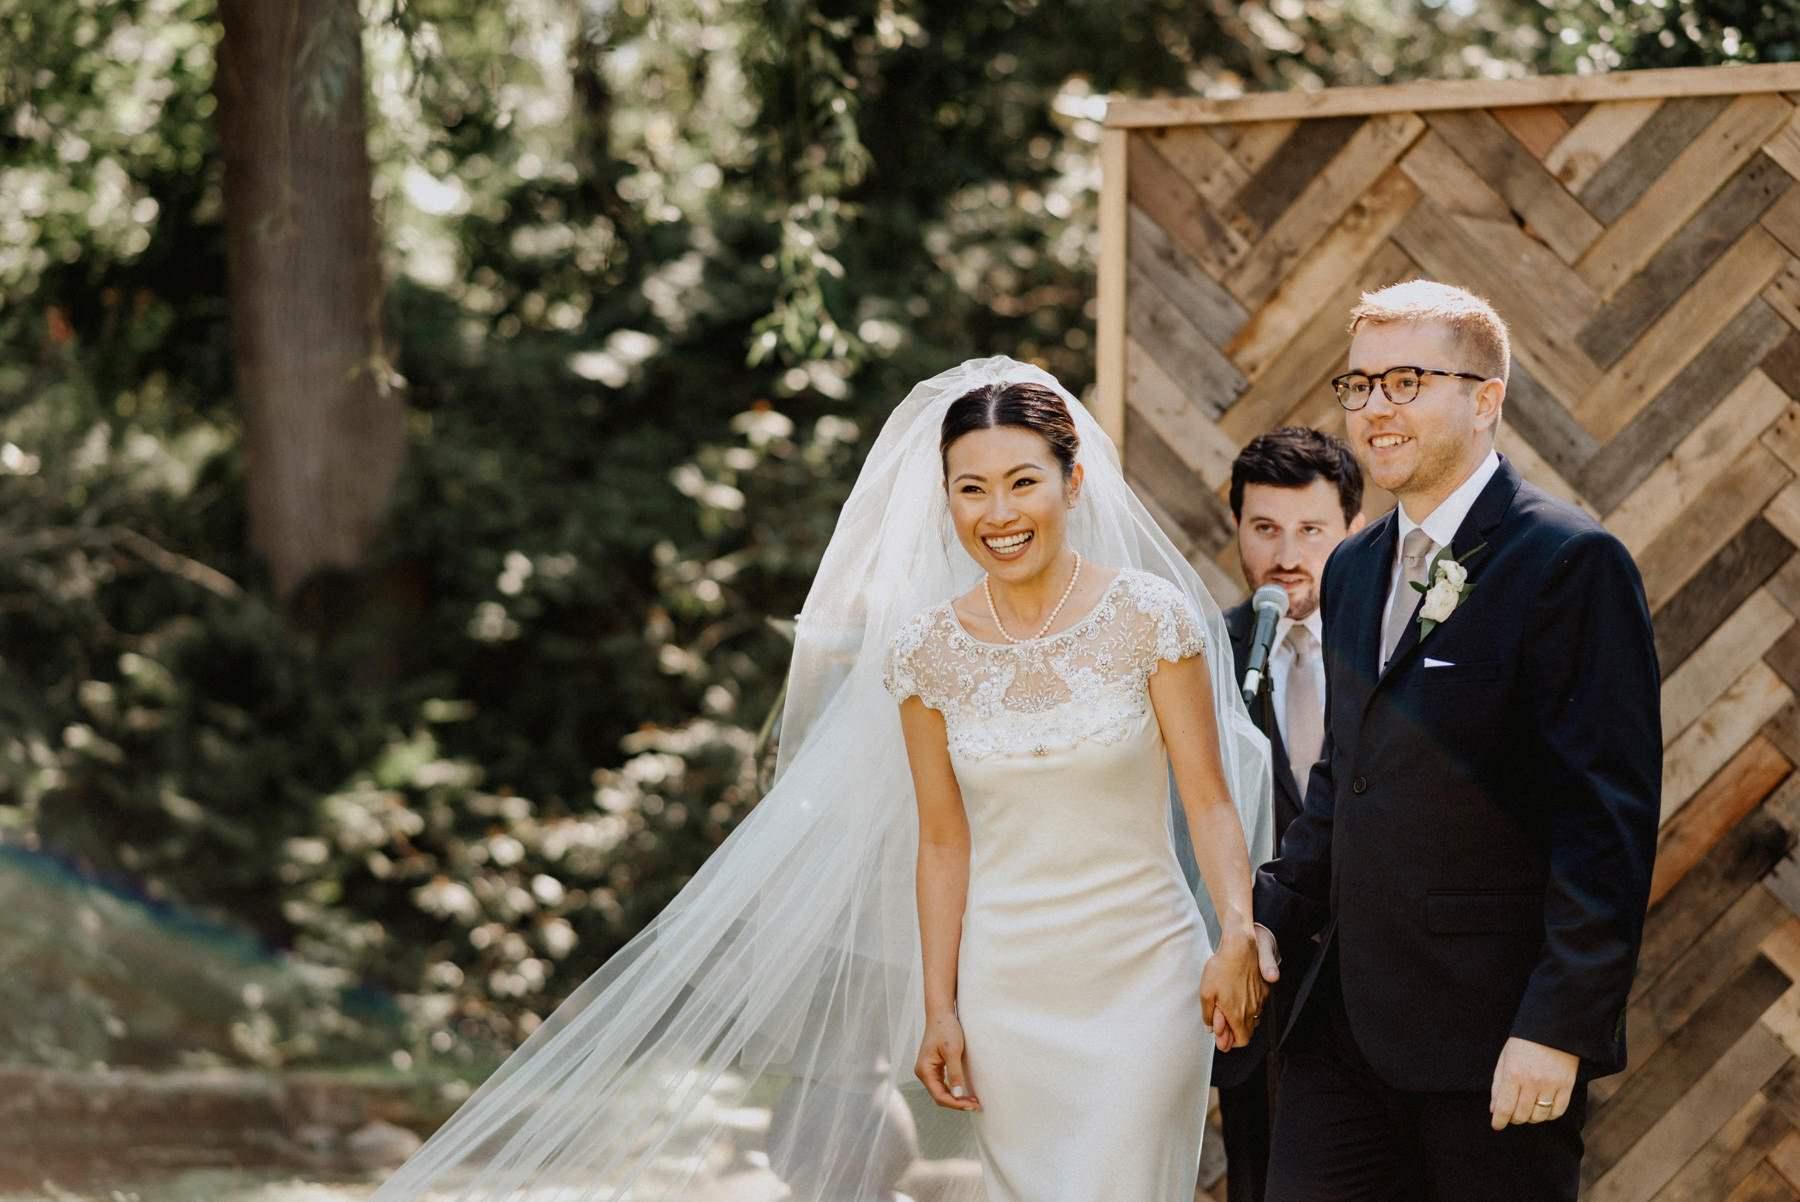 Appleford-estate-wedding-92.jpg